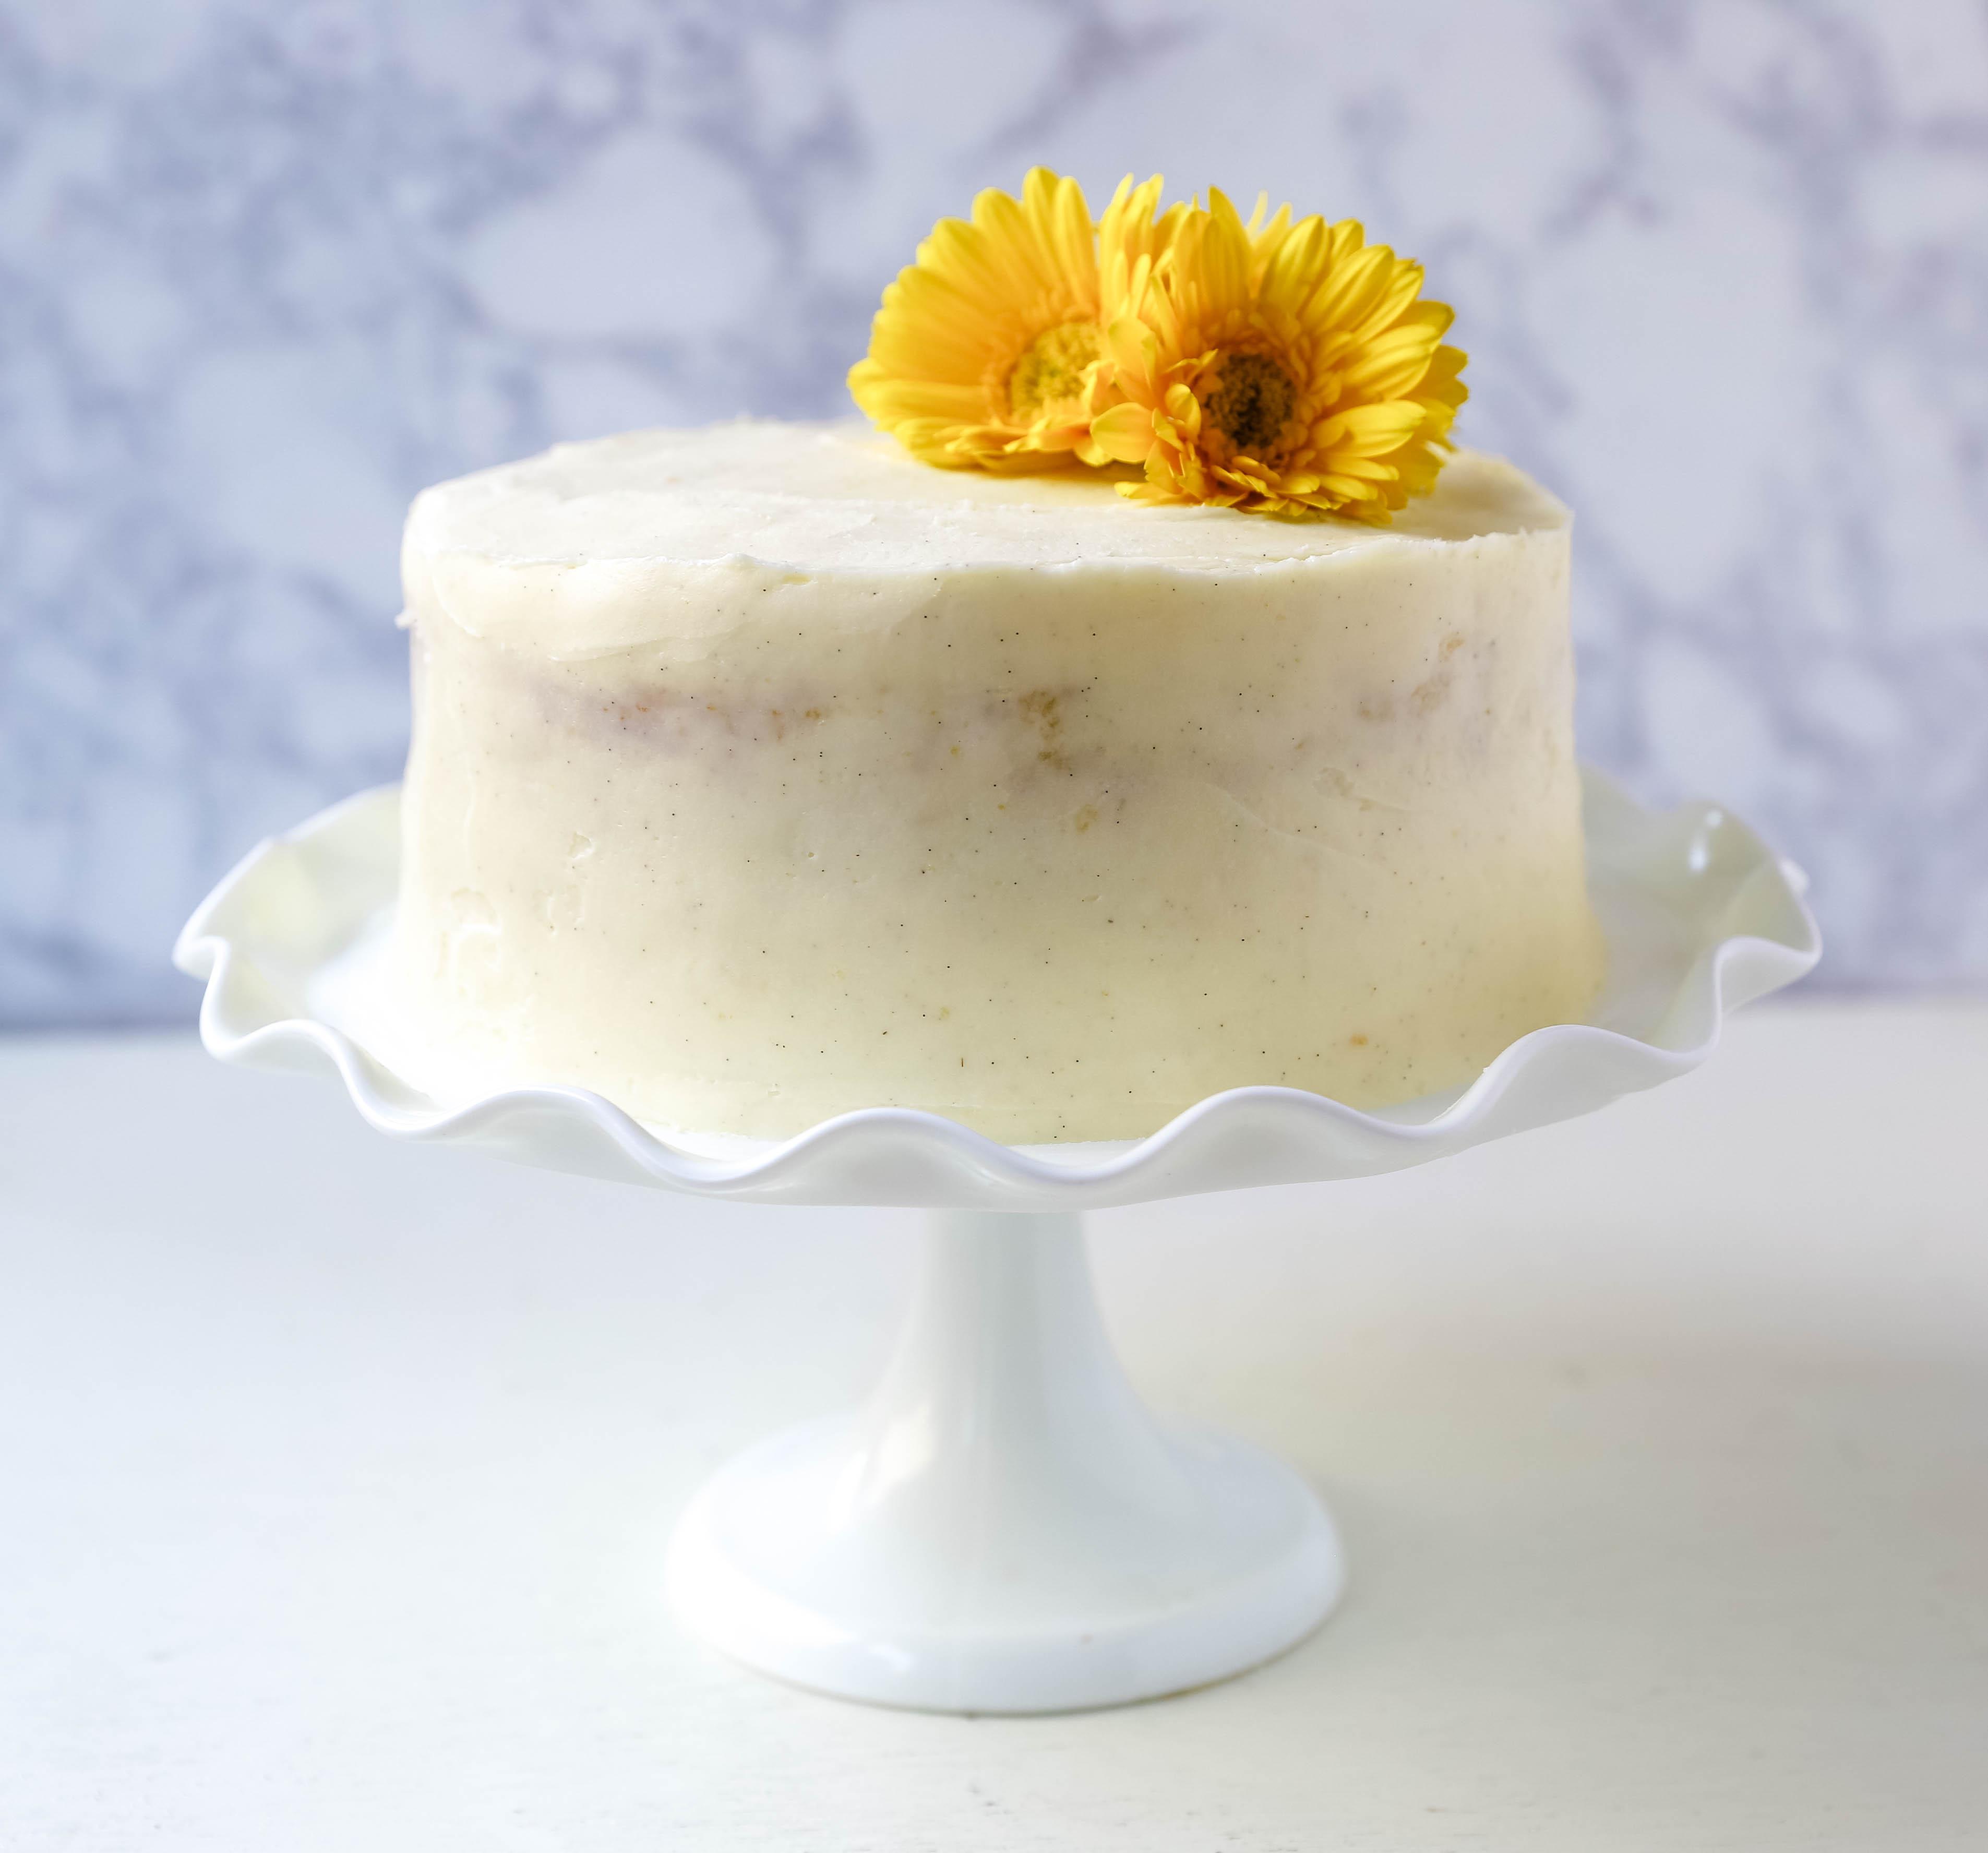 Recette Gâteau Vanille. La meilleure recette de gâteau à la vanille faite maison avec un glaçage au beurre et à la vanille de gousse de vanille. www.modernhoney.com #vanillacake #cake #cakerecipe #vanillacakerecipe